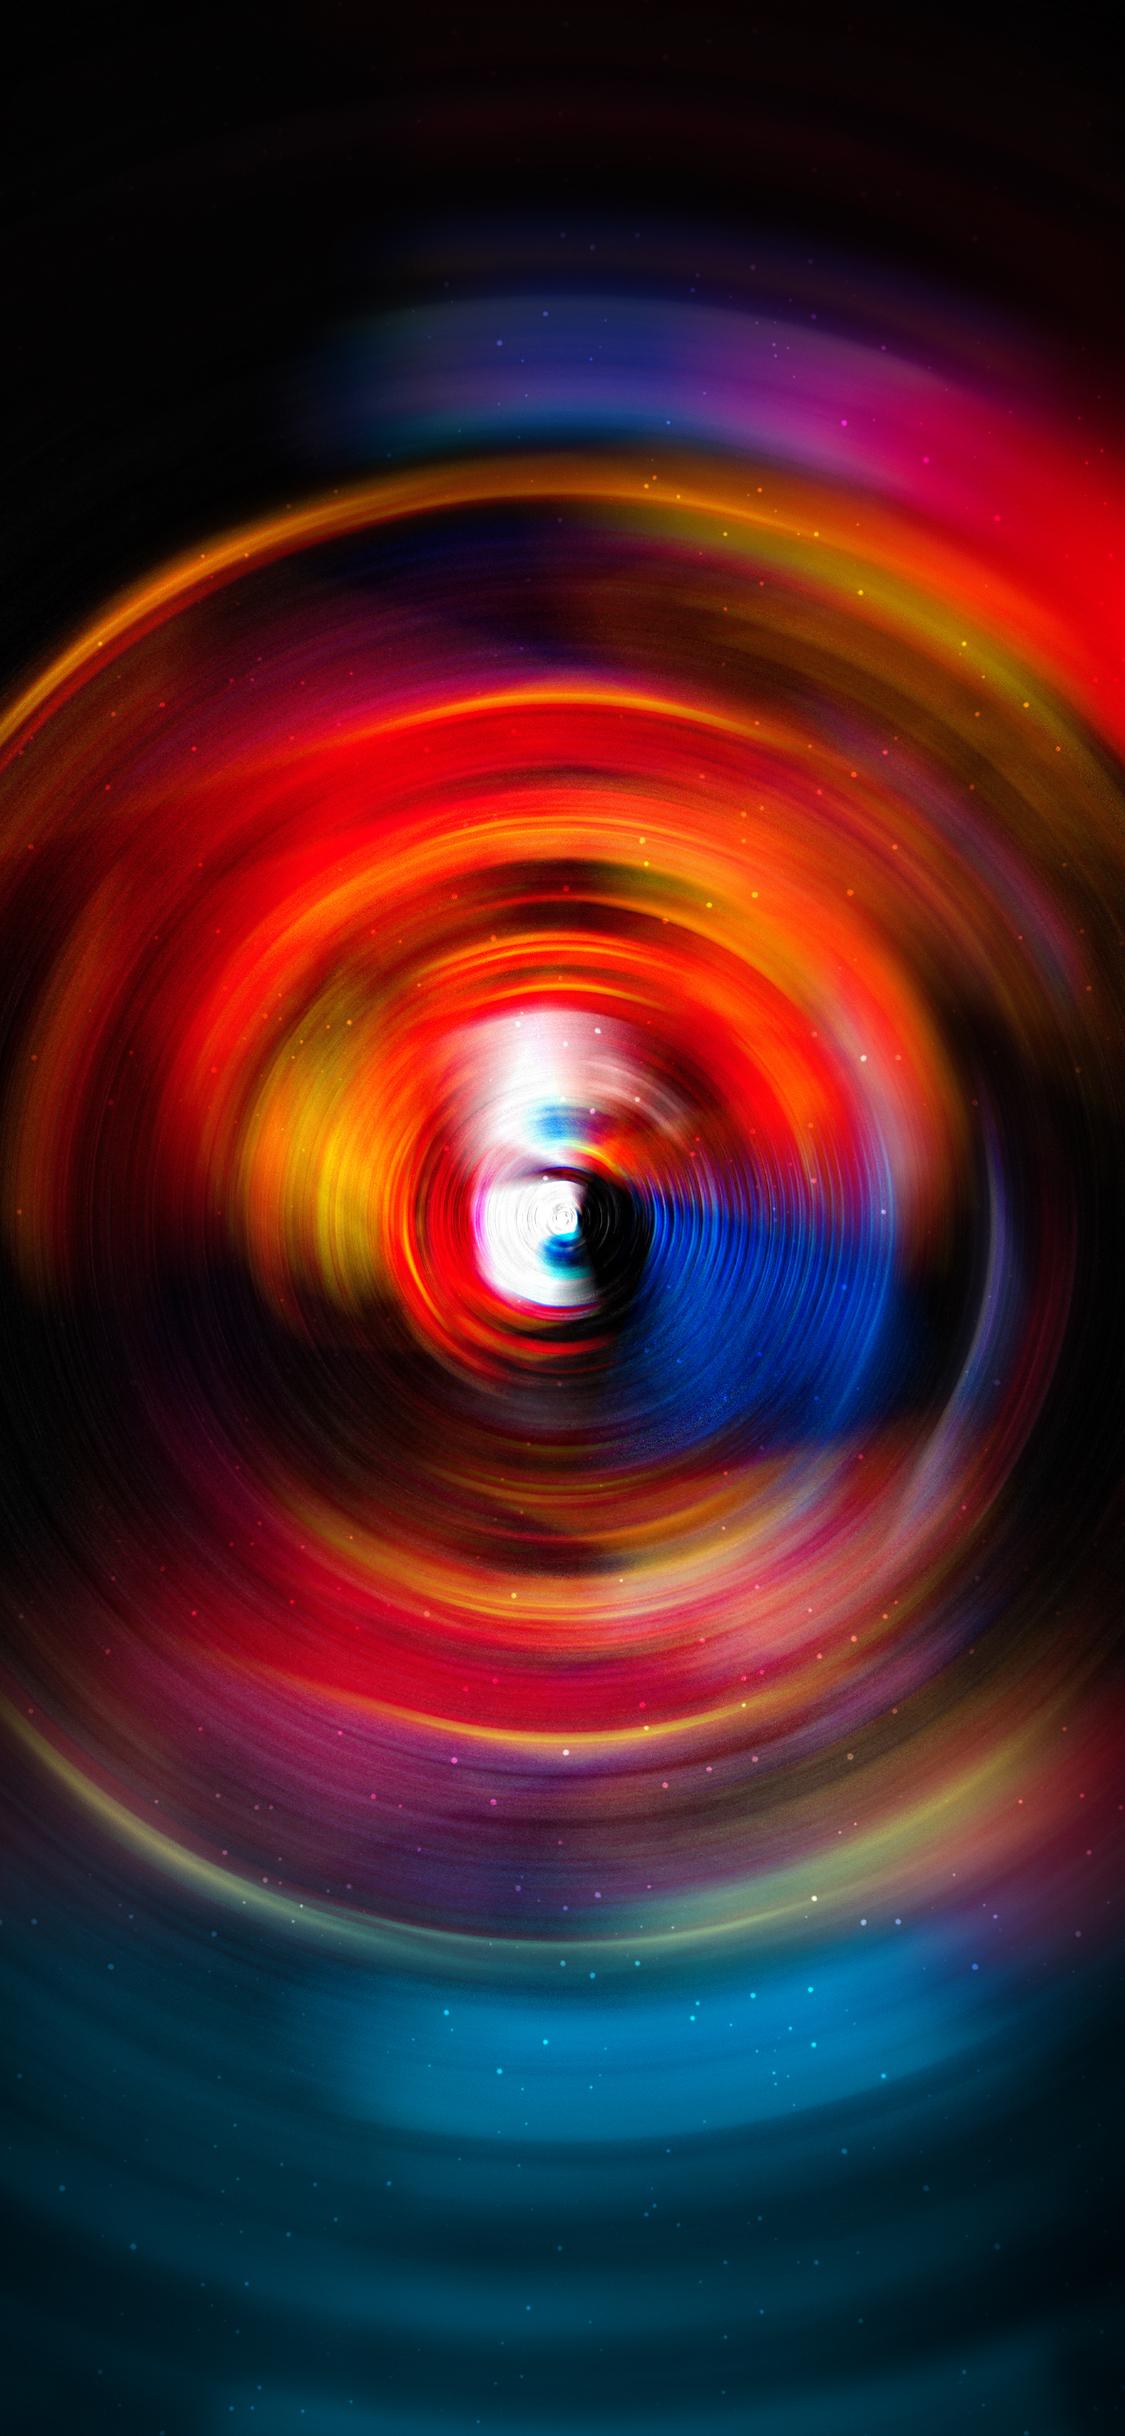 abstract-motion-art-4k-vr.jpg